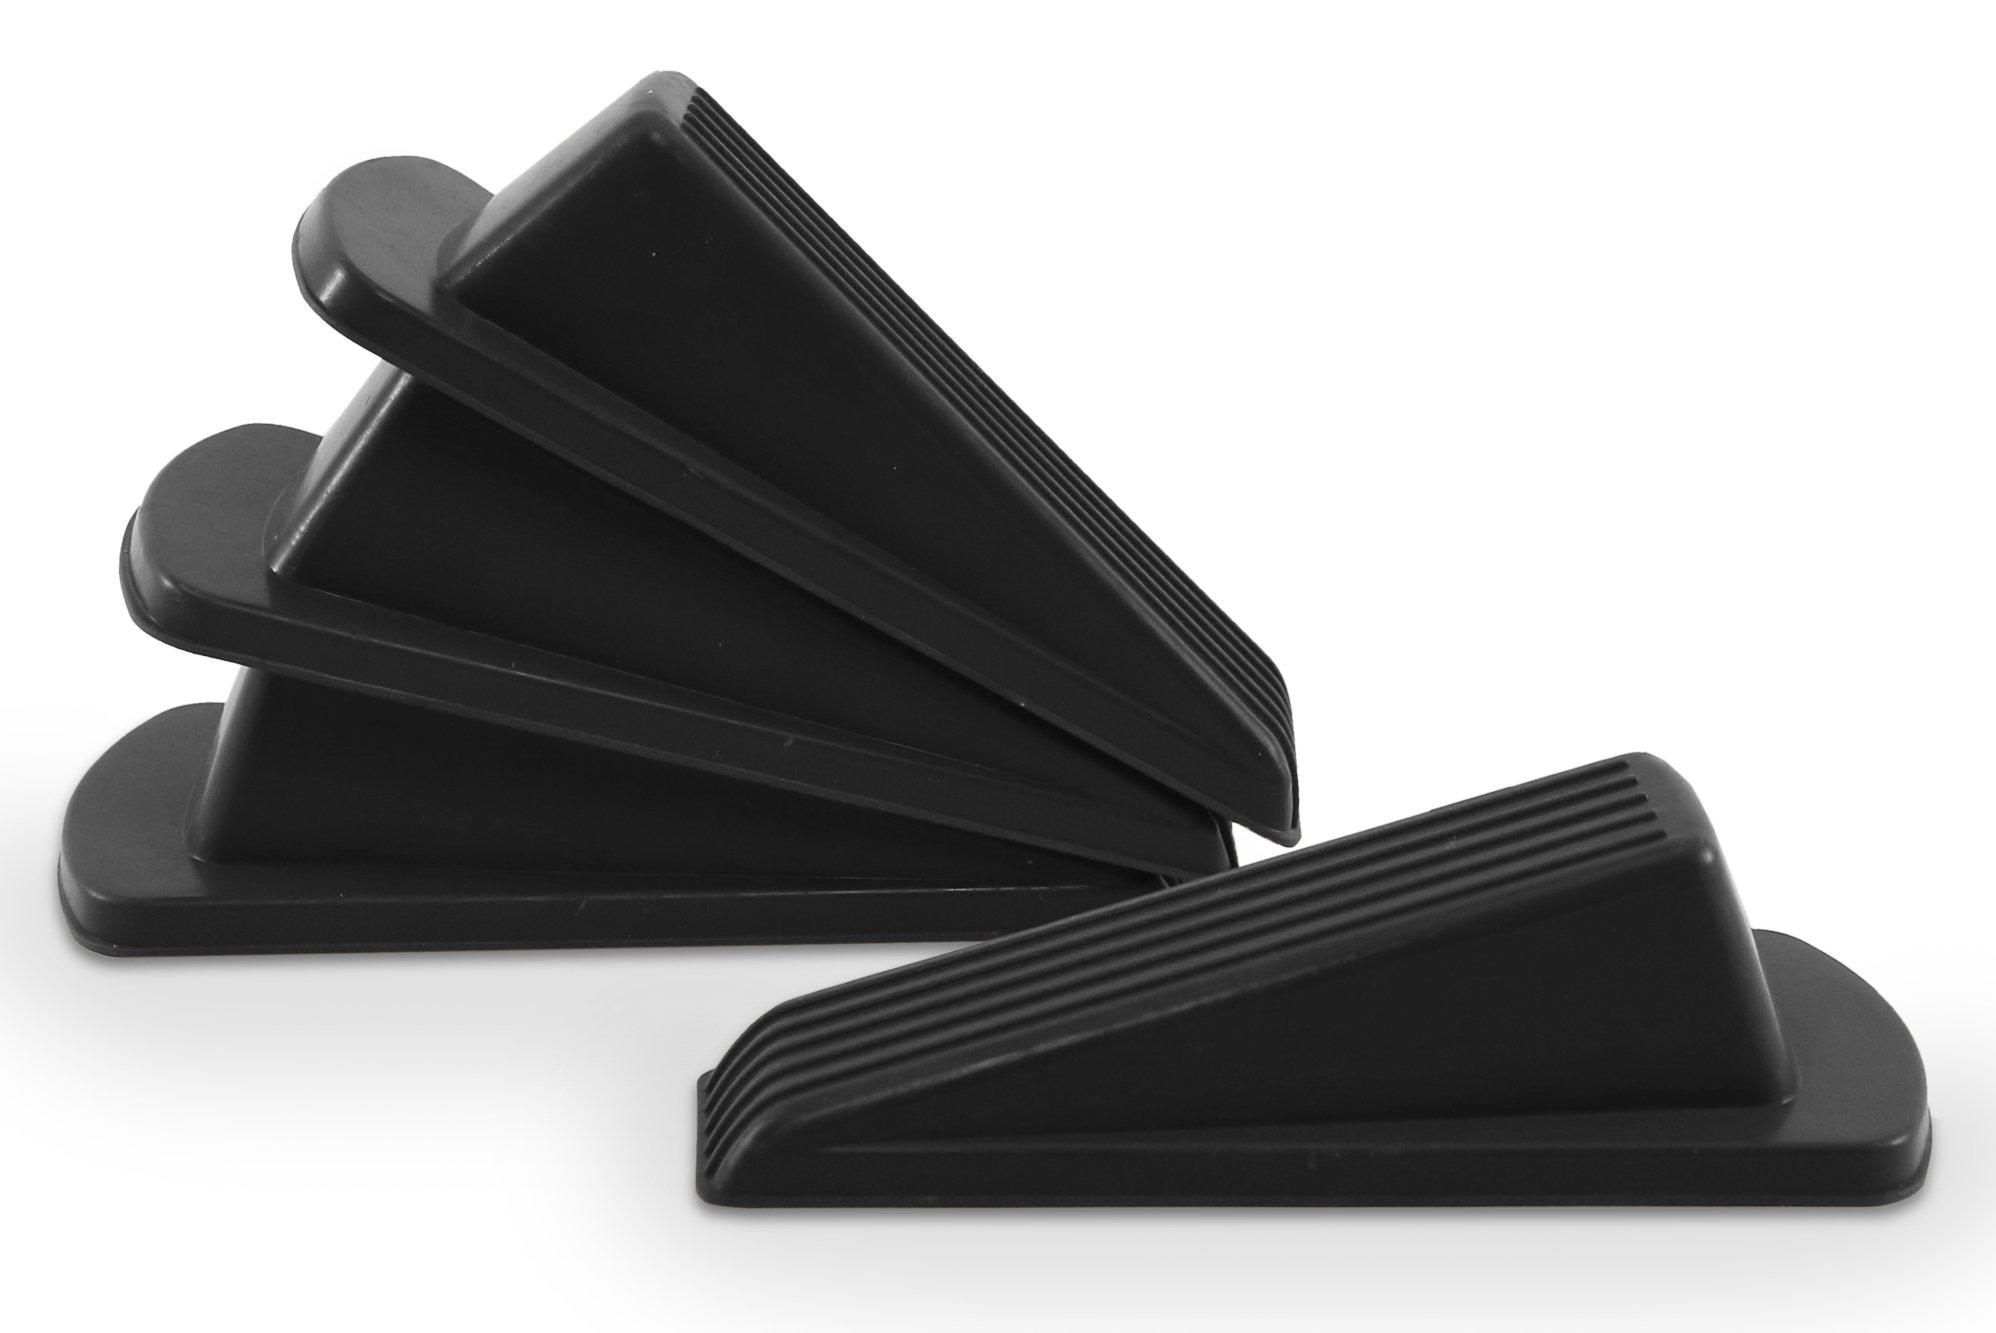 Home Premium Rubber Door Stop - Large Door Stopper Wedge, Multi Surface Design (4 Pack, Black) by HOME PREMIUM (Image #4)